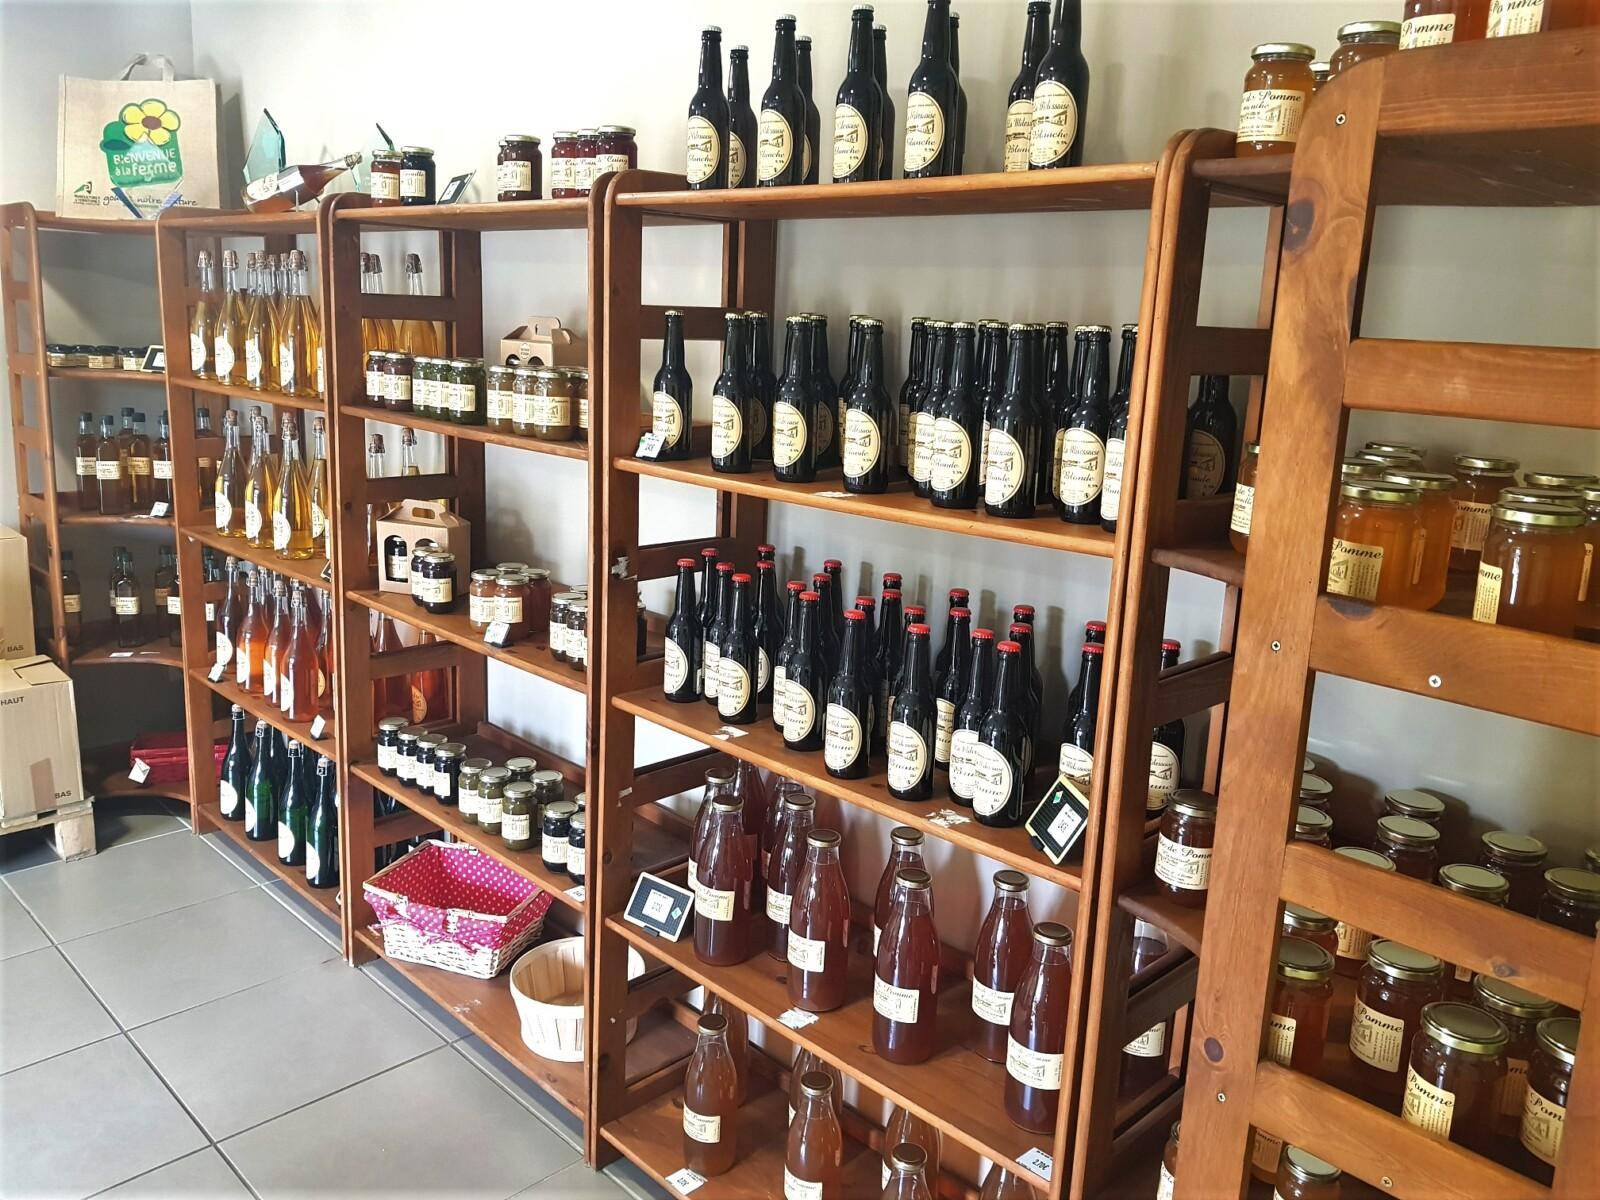 Les Delices De La Ferme Bieres Artisanales Sarthe 103656327 1607471836121094 2968885267370629075 N 1